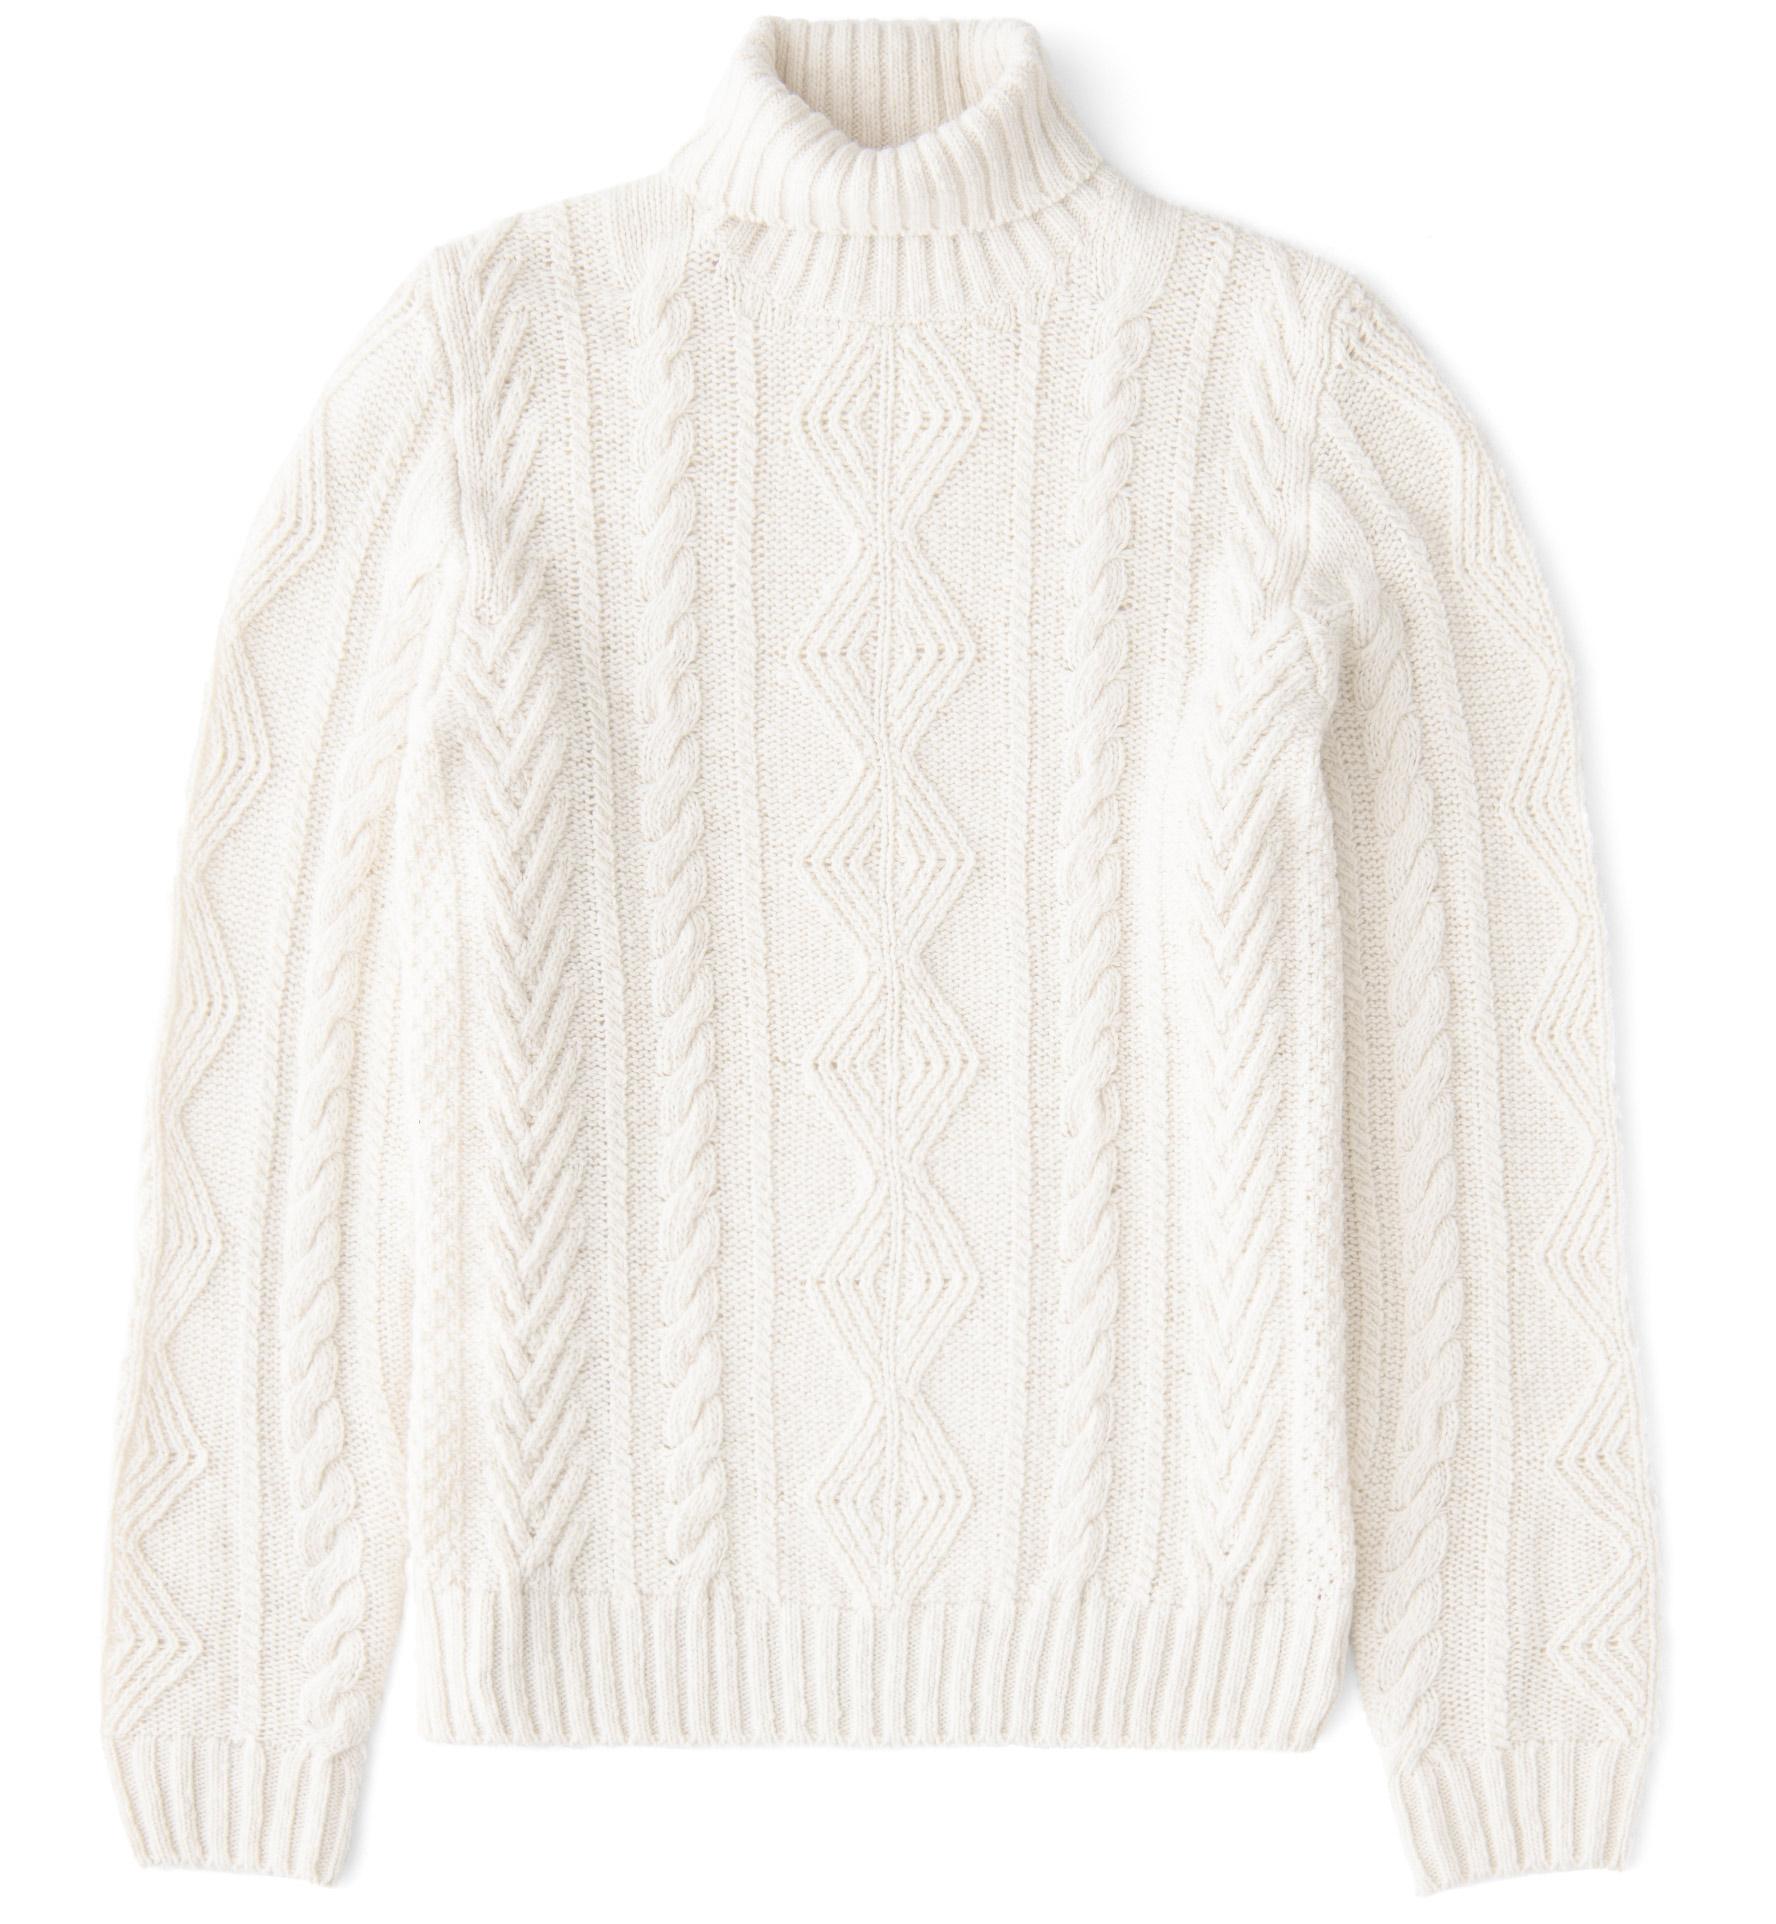 Zoom Image of Italian Cream Wool and Cashmere Aran Turtleneck Sweater